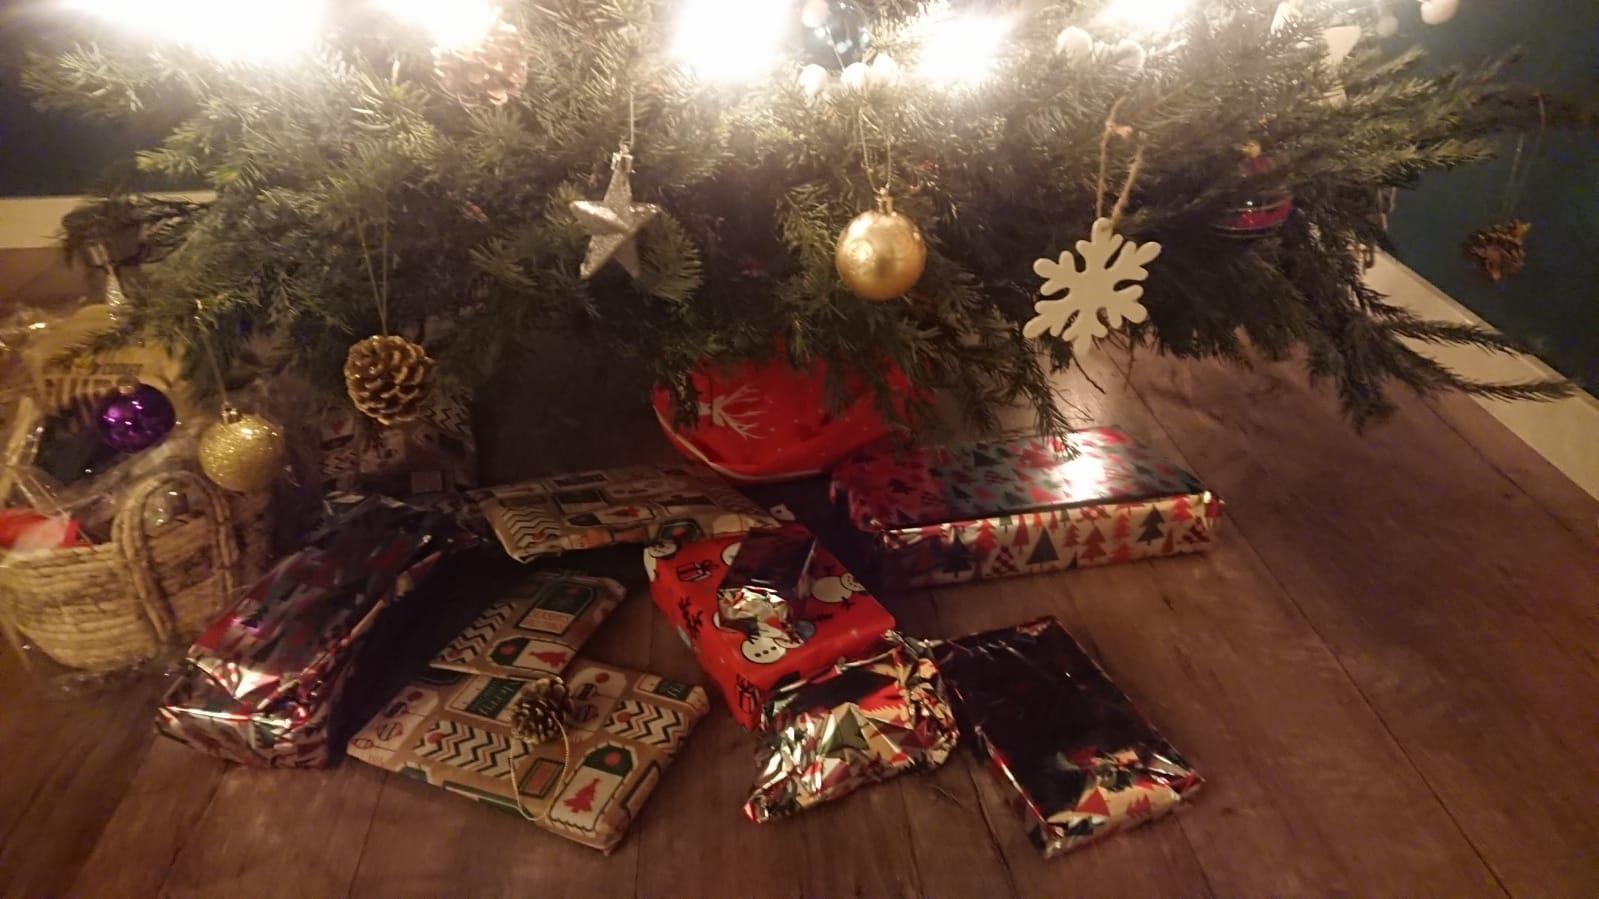 Kerst 2020 cadeautjes - Margreet Stegeman